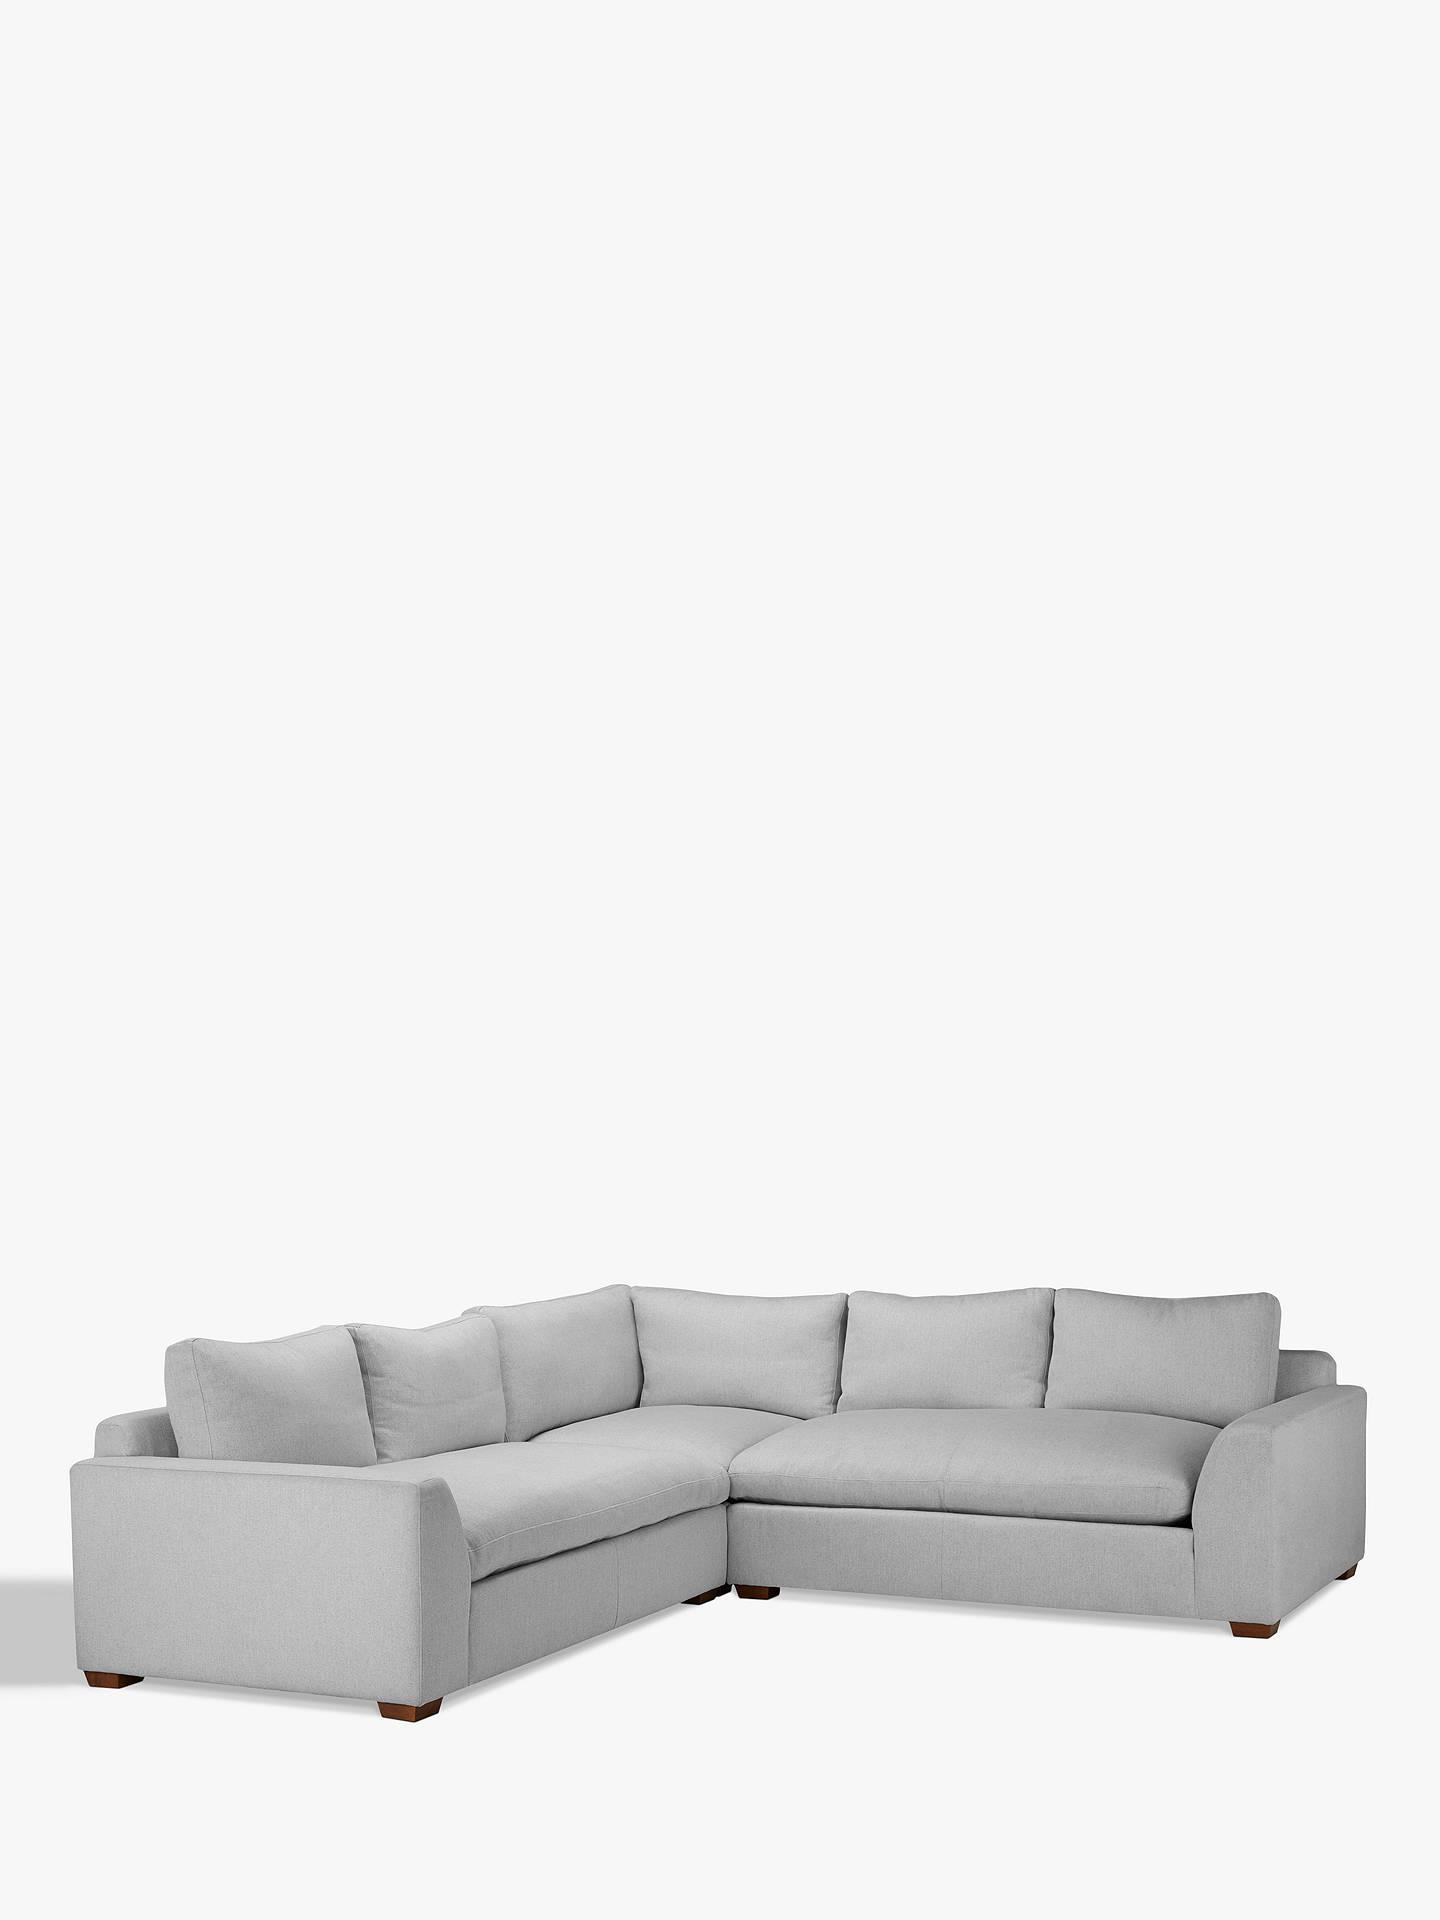 John Lewis & Partners Tortona Corner Sofa